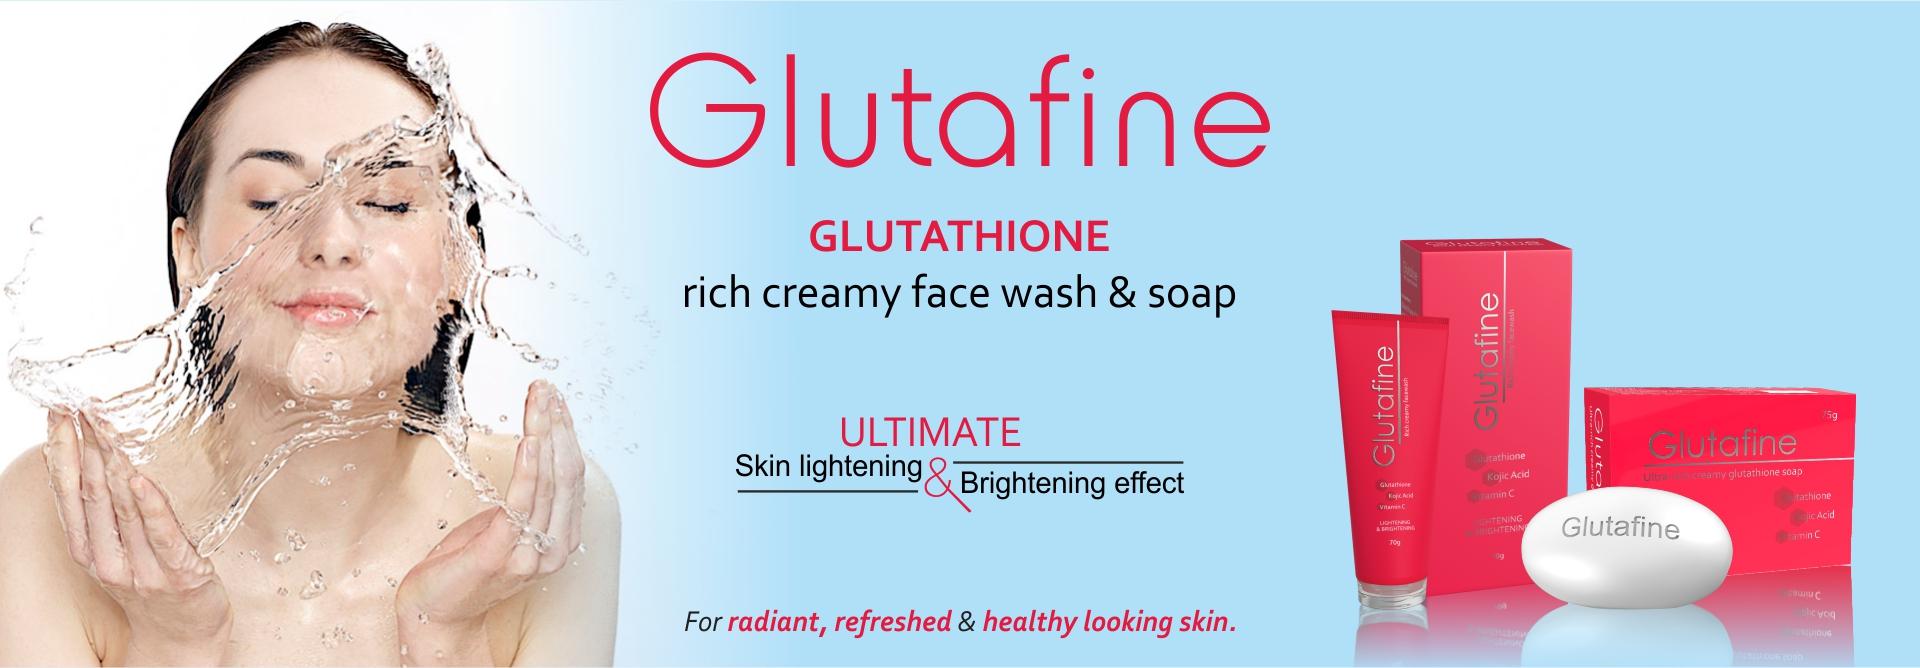 Glutafine